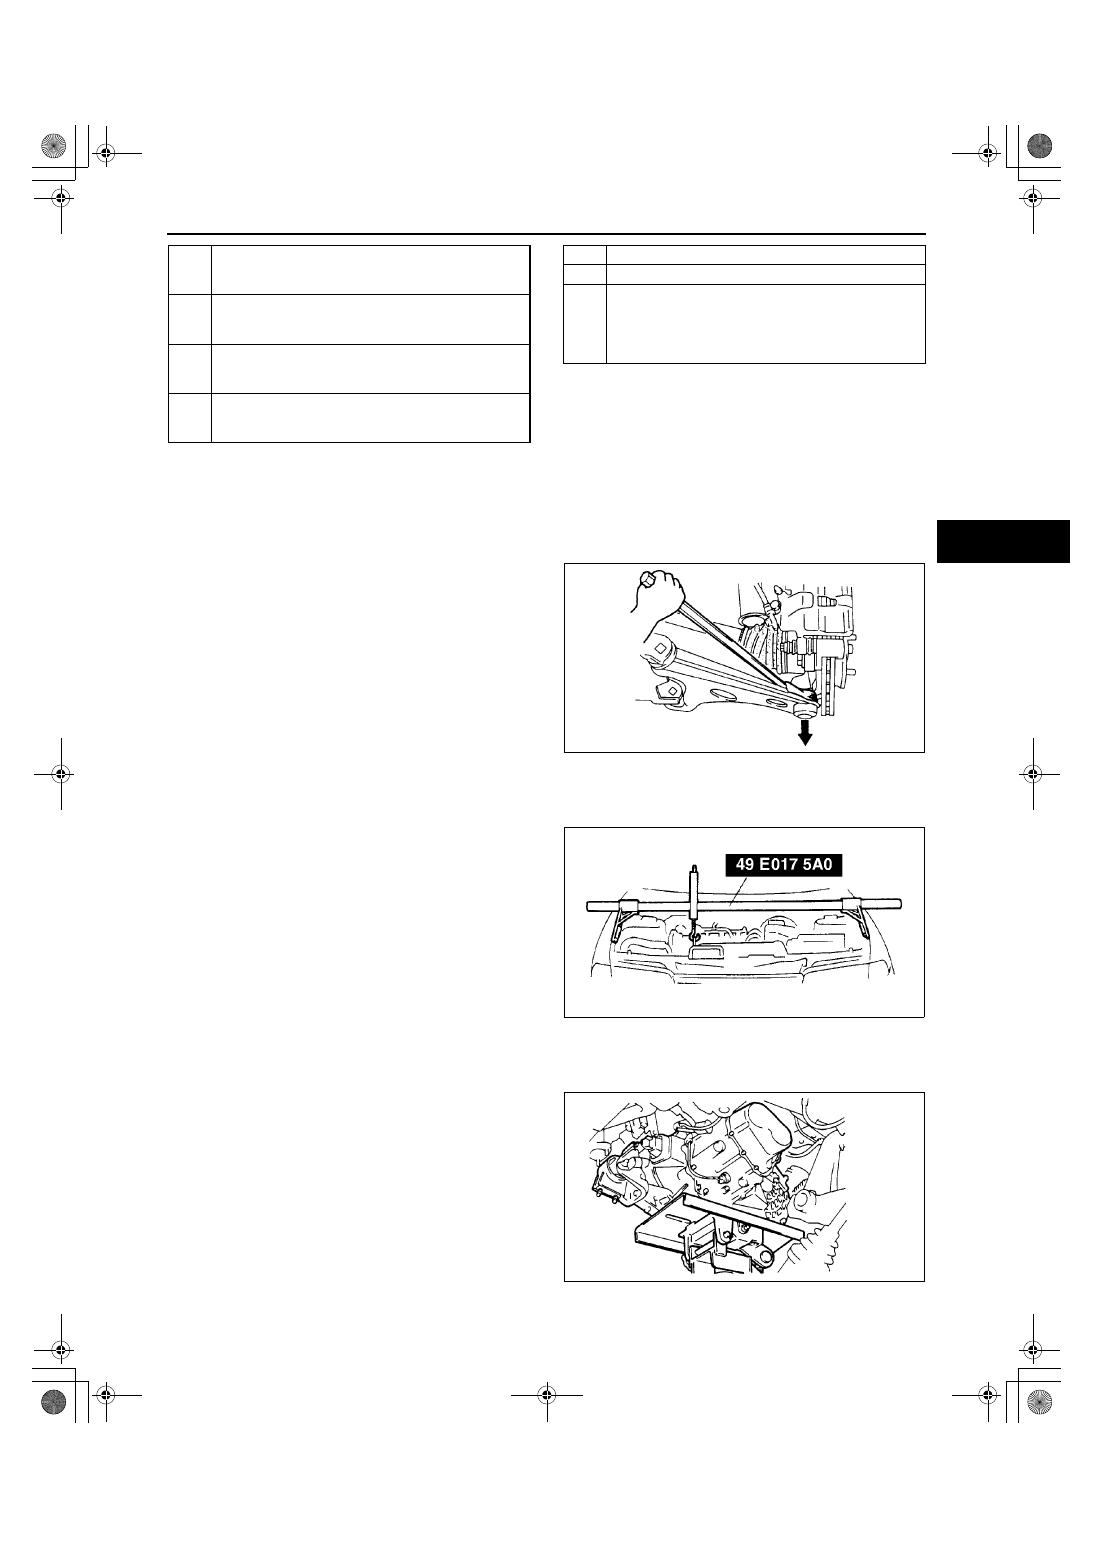 mazda protege 5 manual part 247 rh zinref ru Front Wheel Drive Transaxle Transaxle vs Transmission